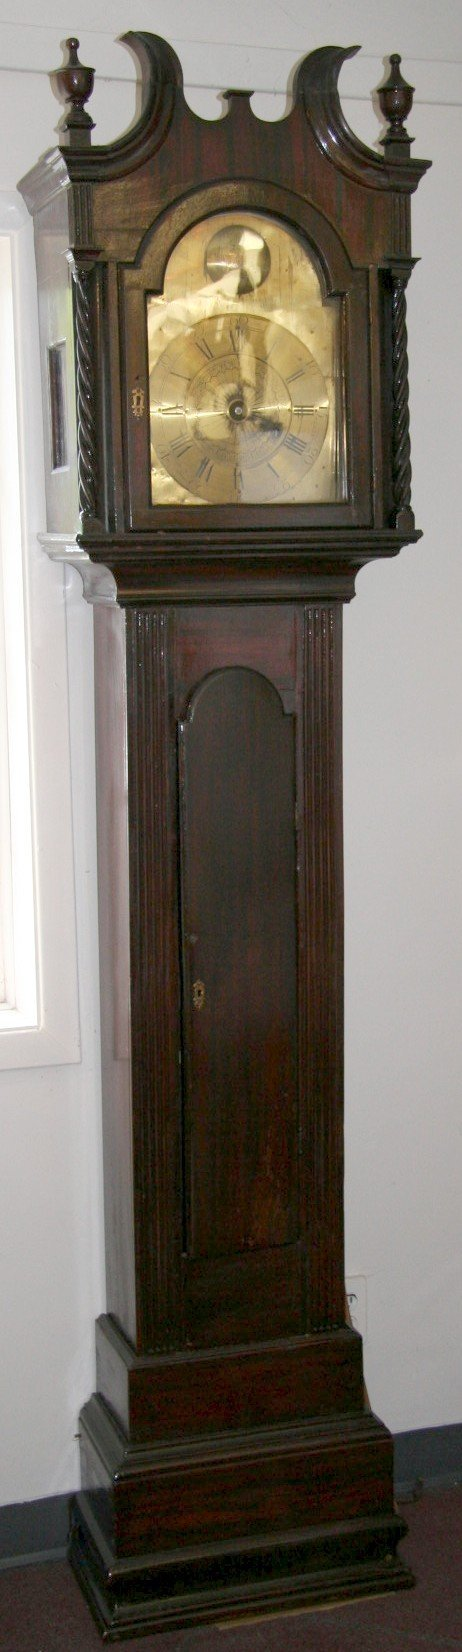 120: Grandfather clock